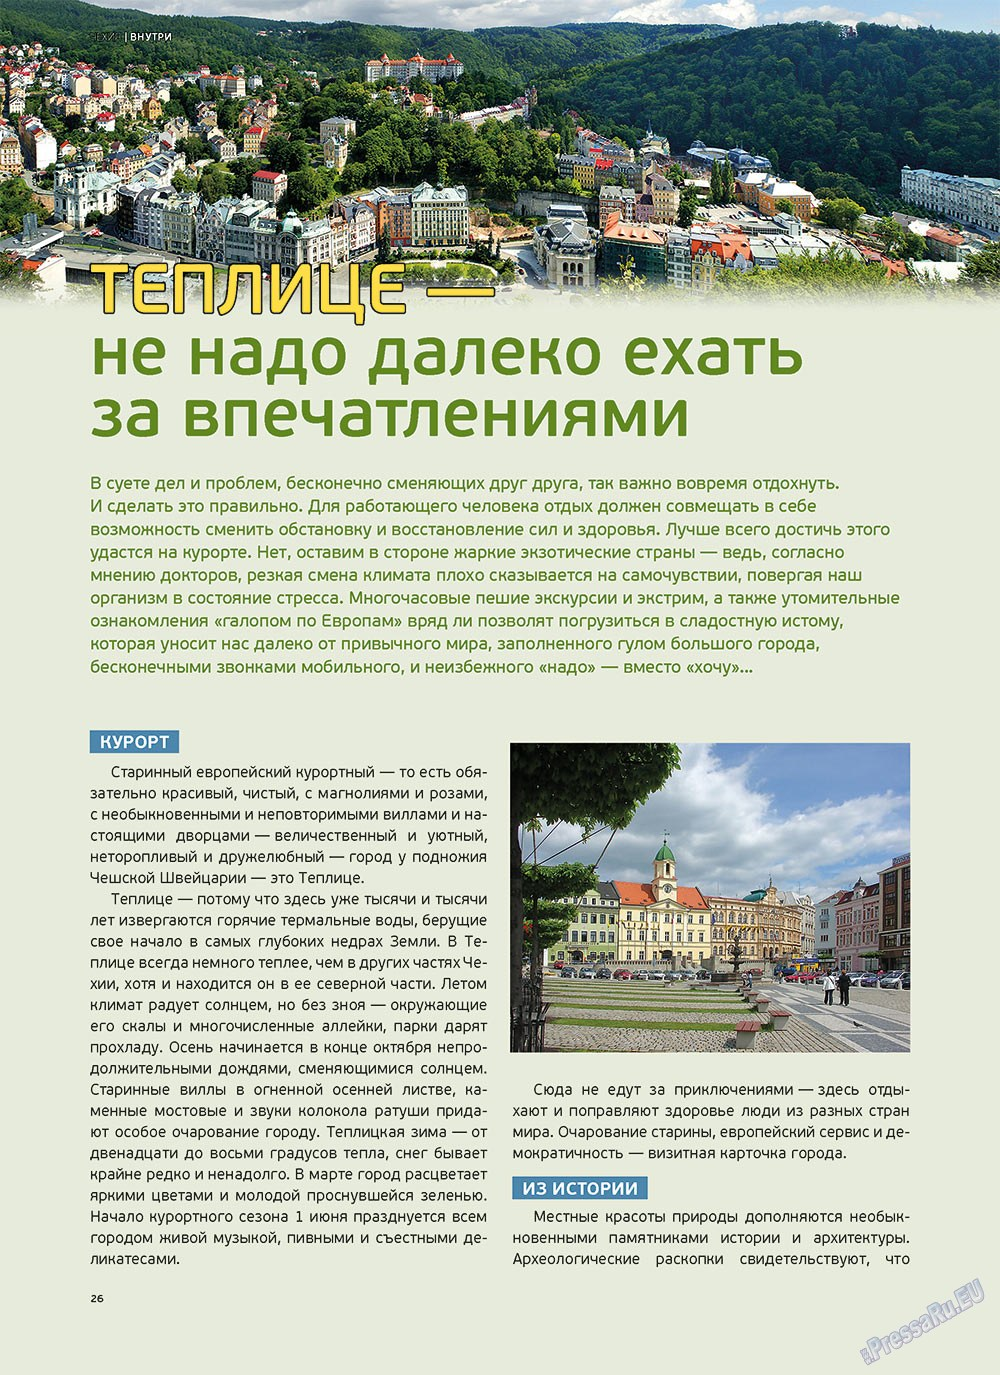 Артек (журнал). 2012 год, номер 5, стр. 28